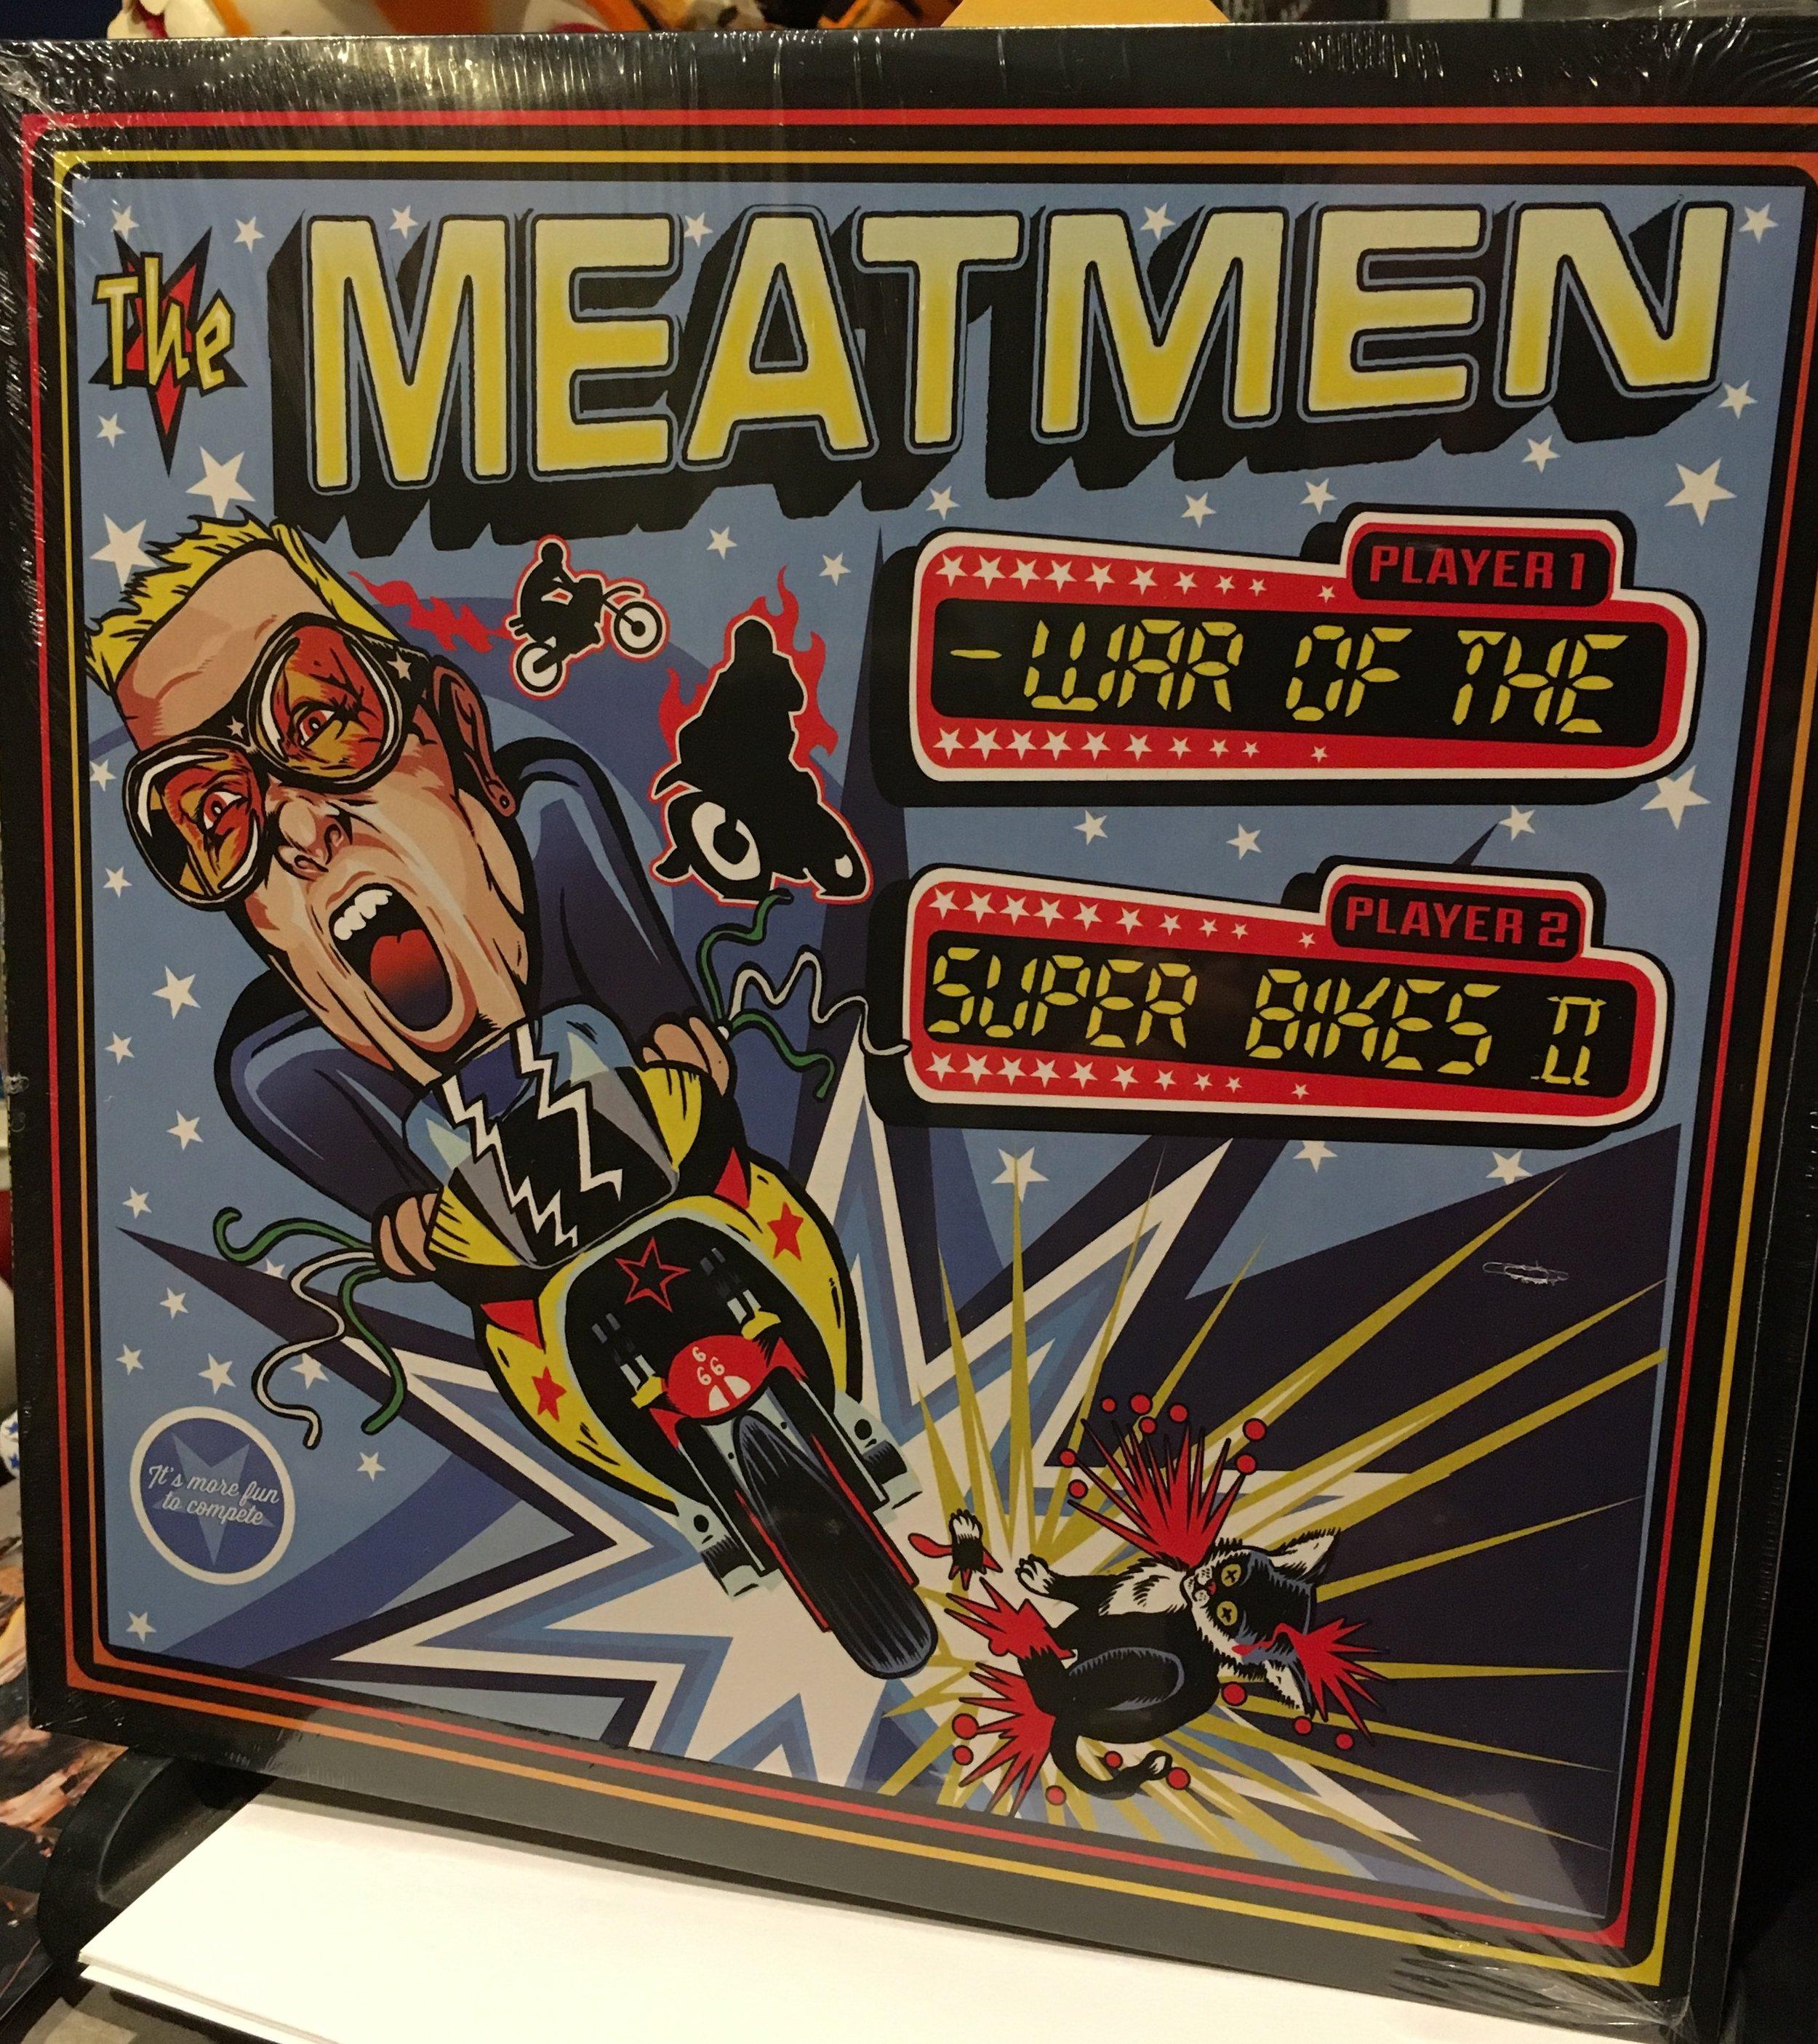 Merch — The Meatmen